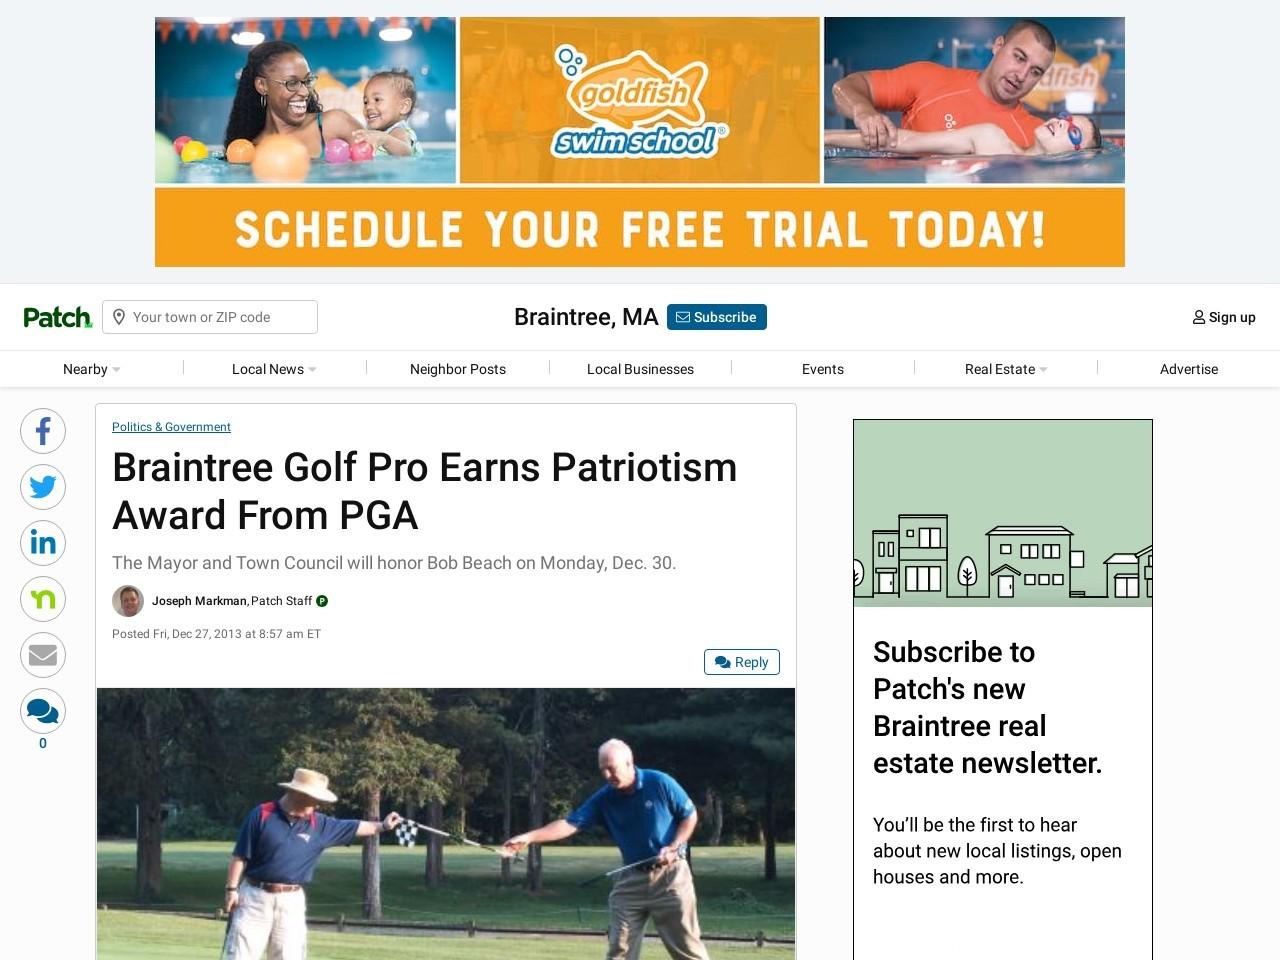 Braintree Golf Pro Earns Patriotism Award From PGA